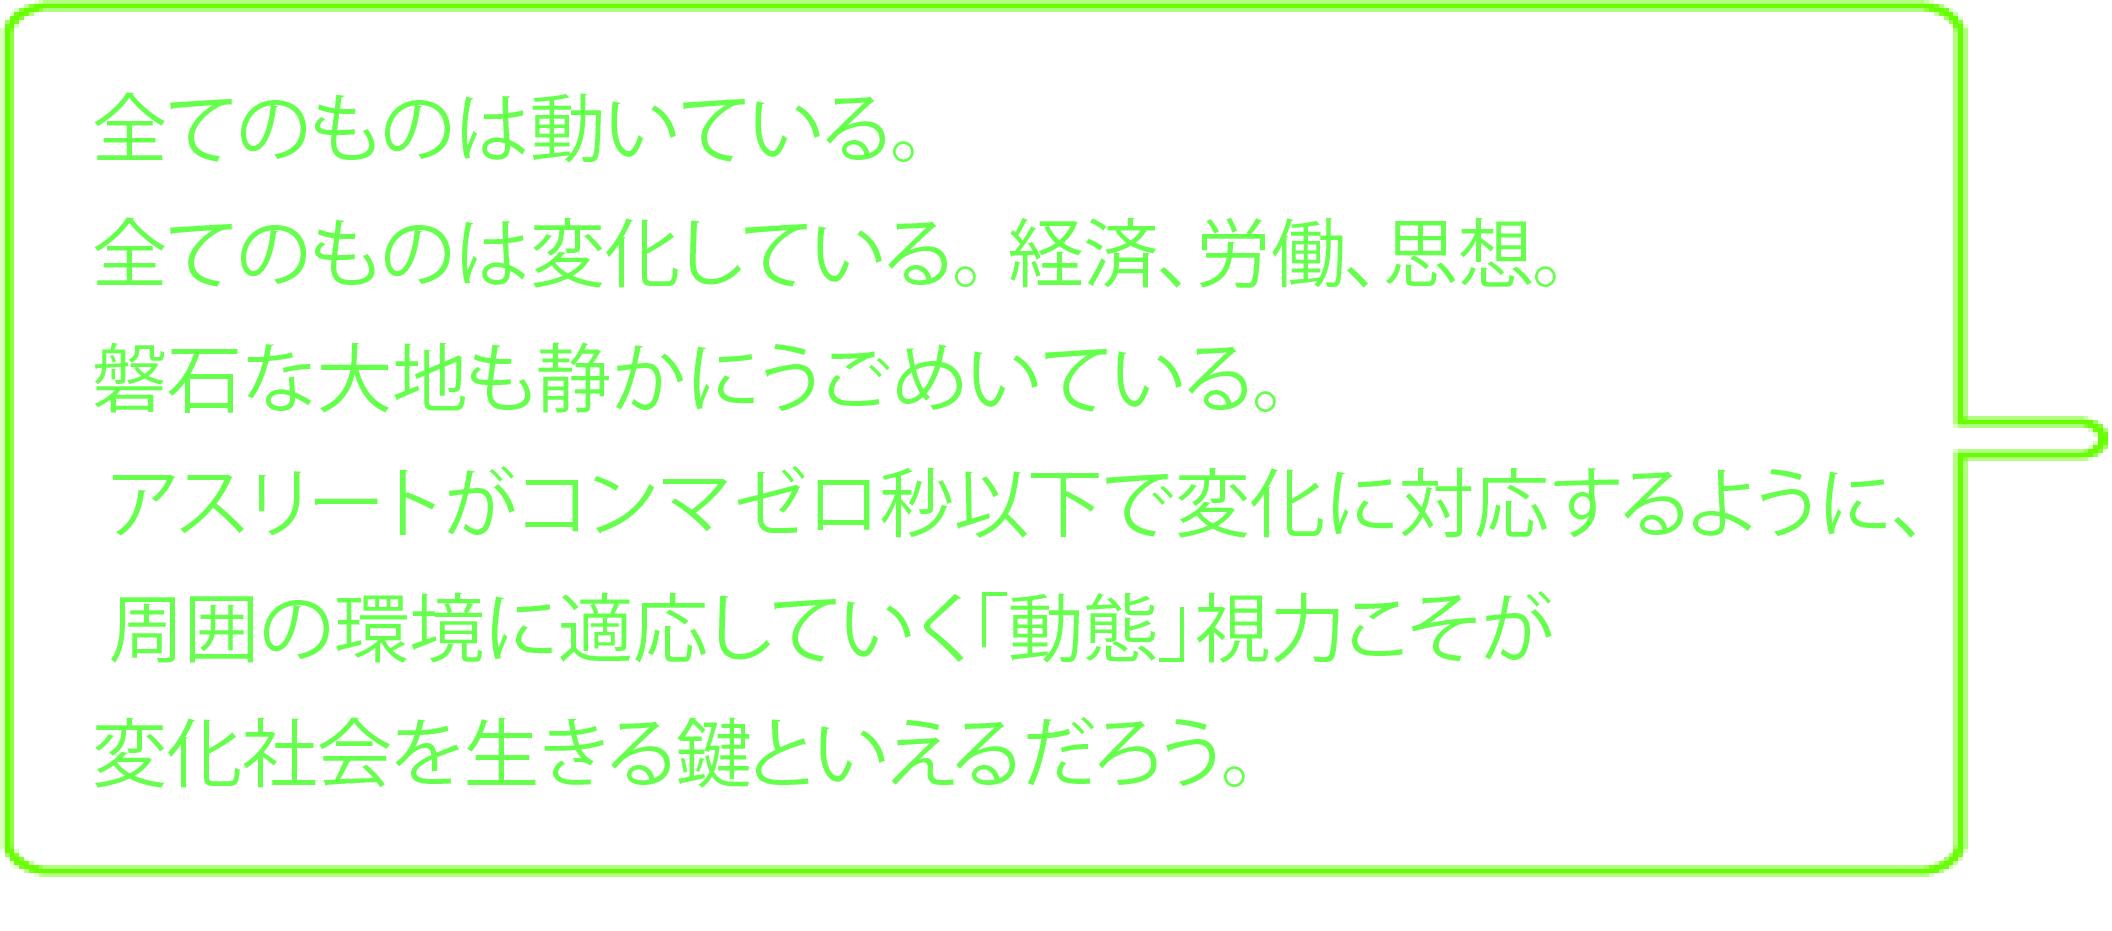 WAKU_doutai.jpg